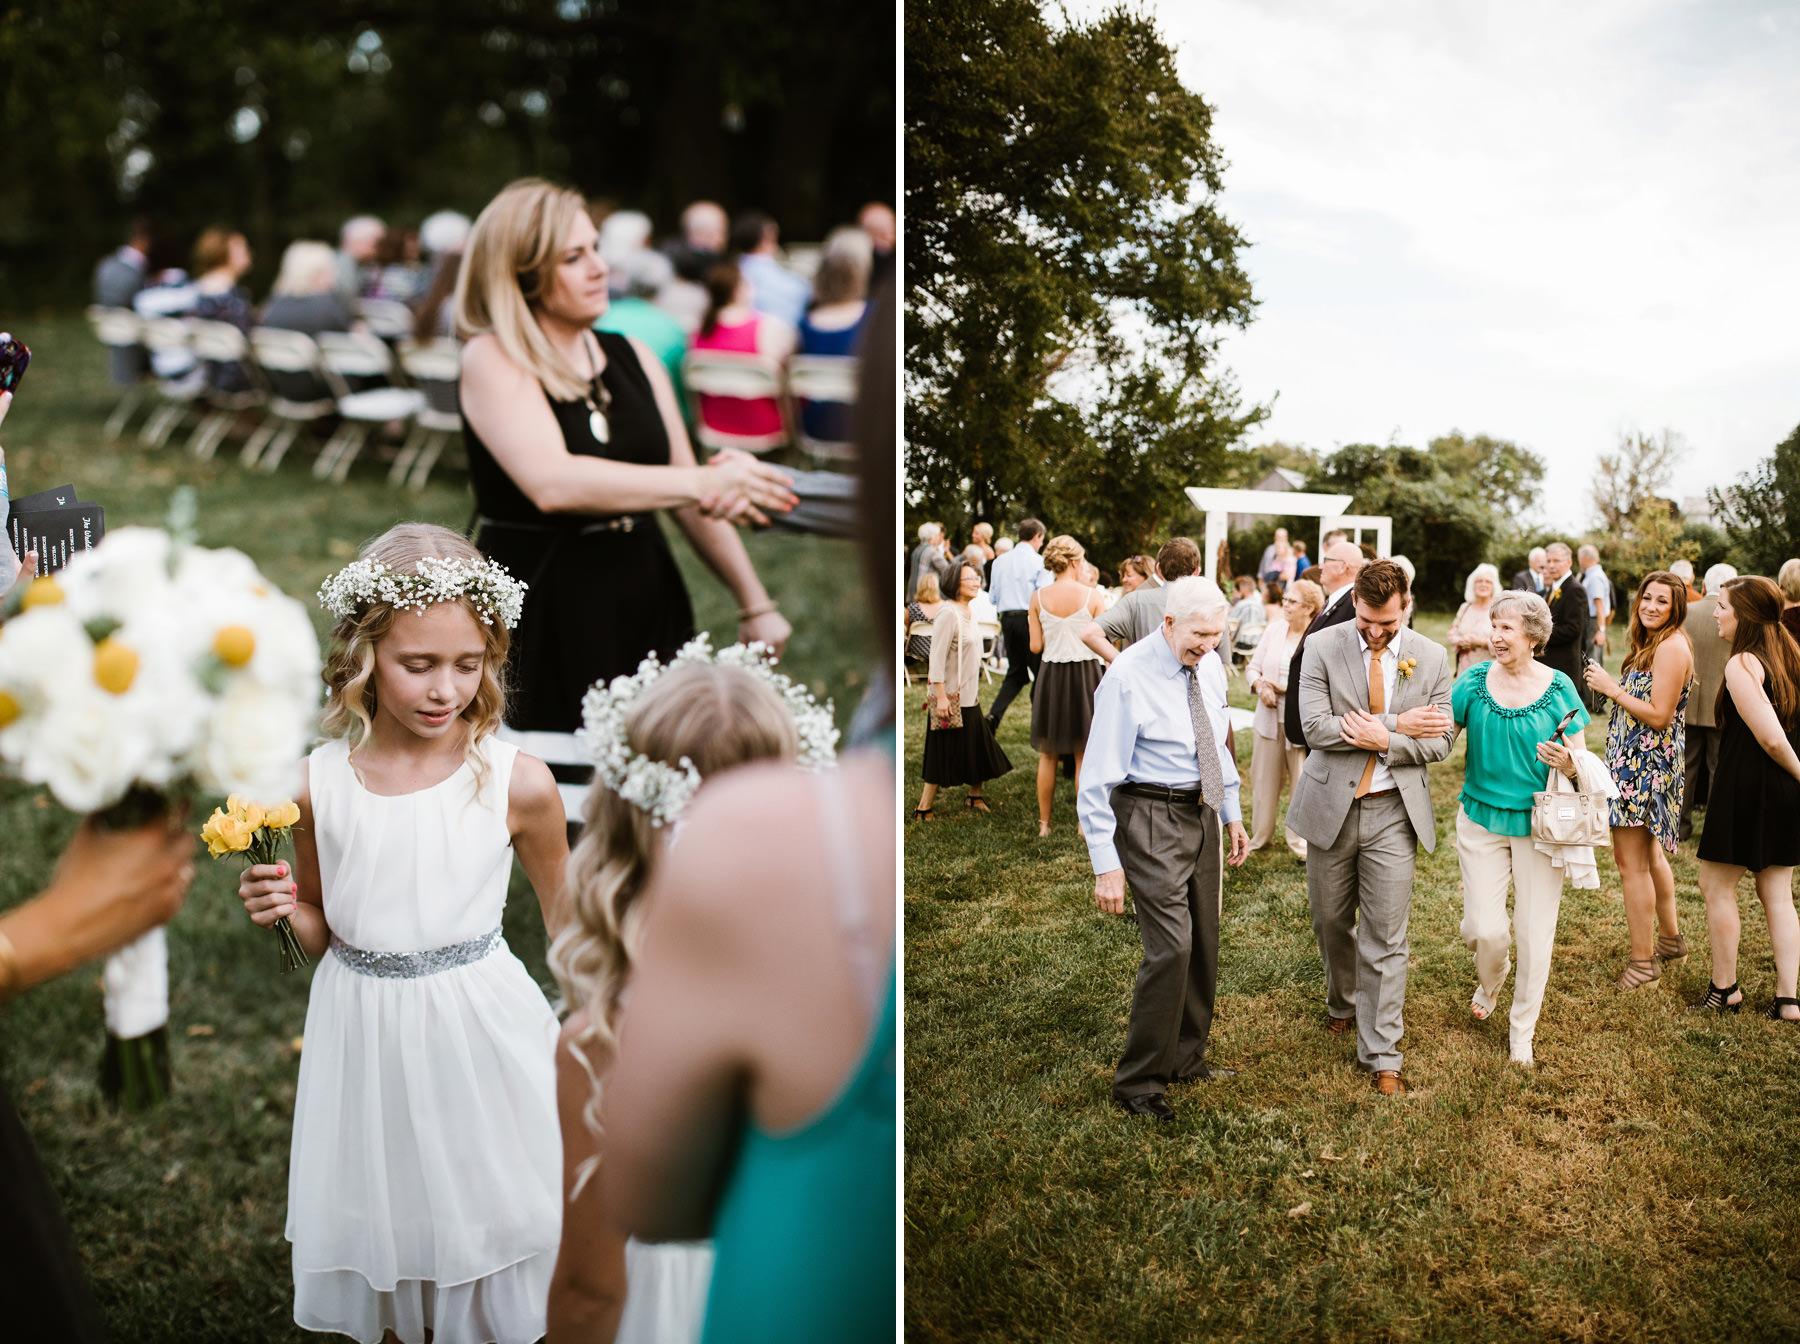 Alldredge Orchard Kansas City_Kindling Wedding Photography BLOG 50.JPG